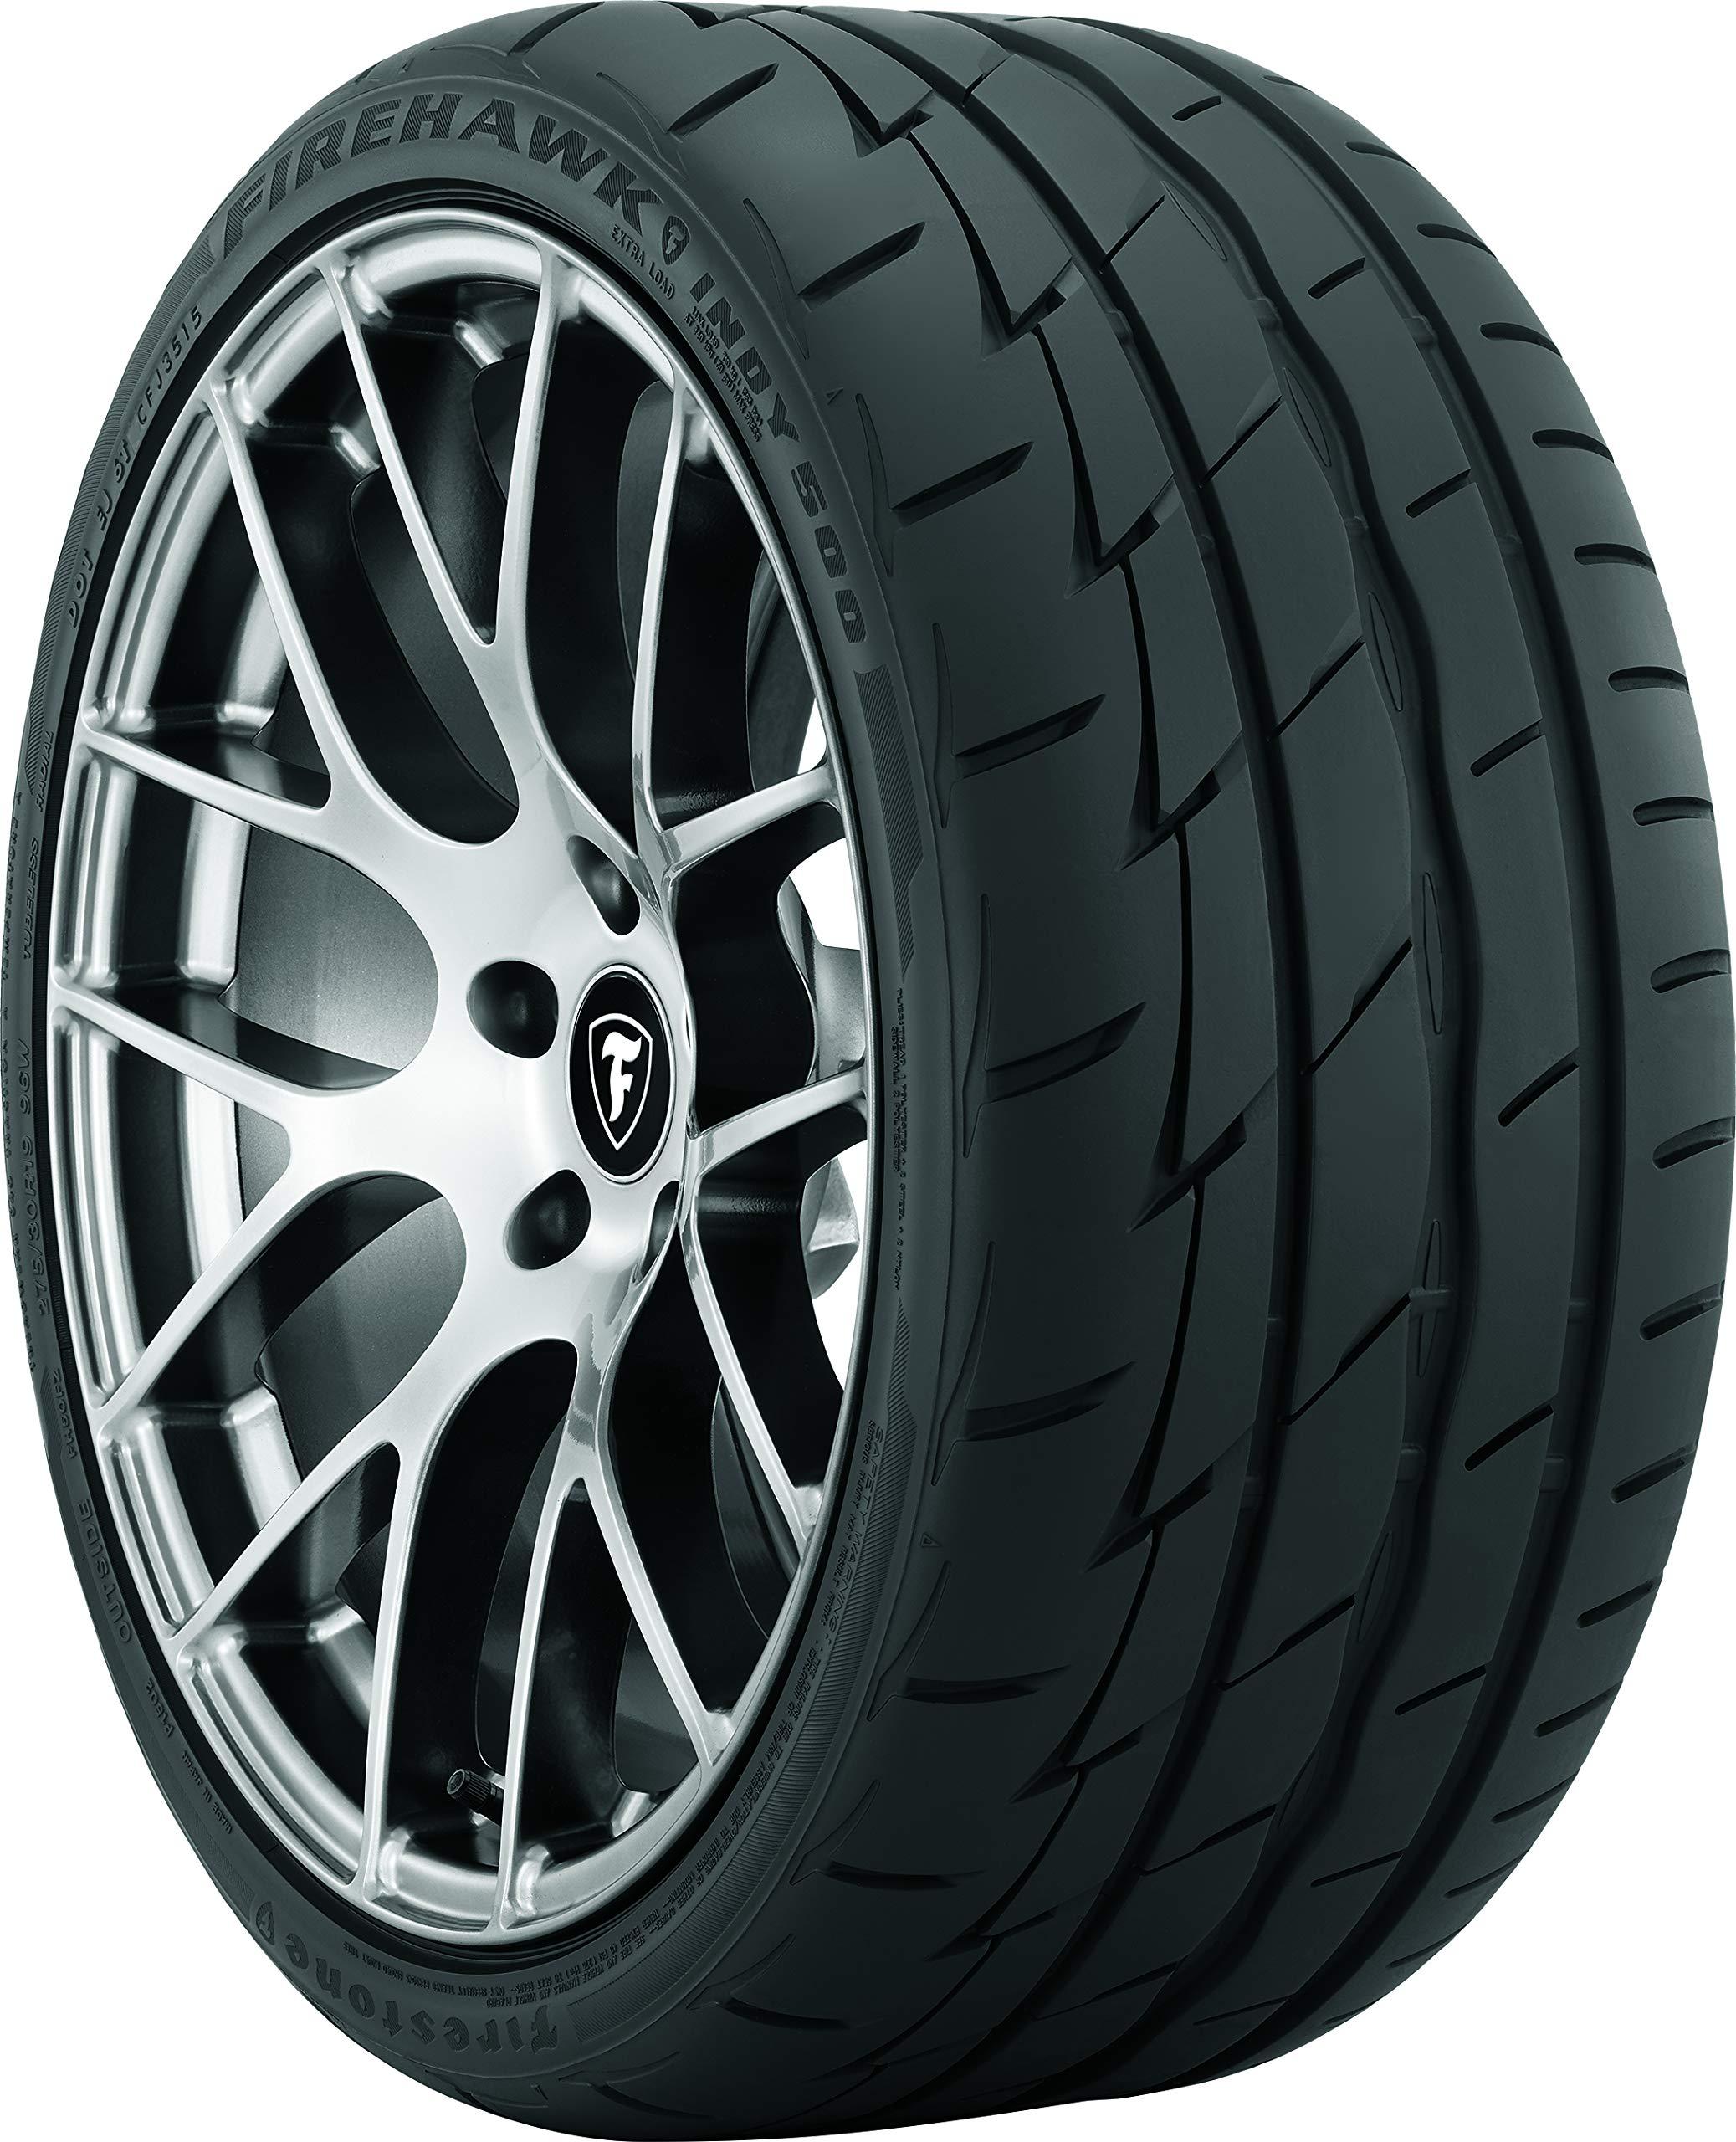 Firestone Firehawk Indy 500 Ultra-High Summer Peformance Tire 225/45R17 94 W Extra Load